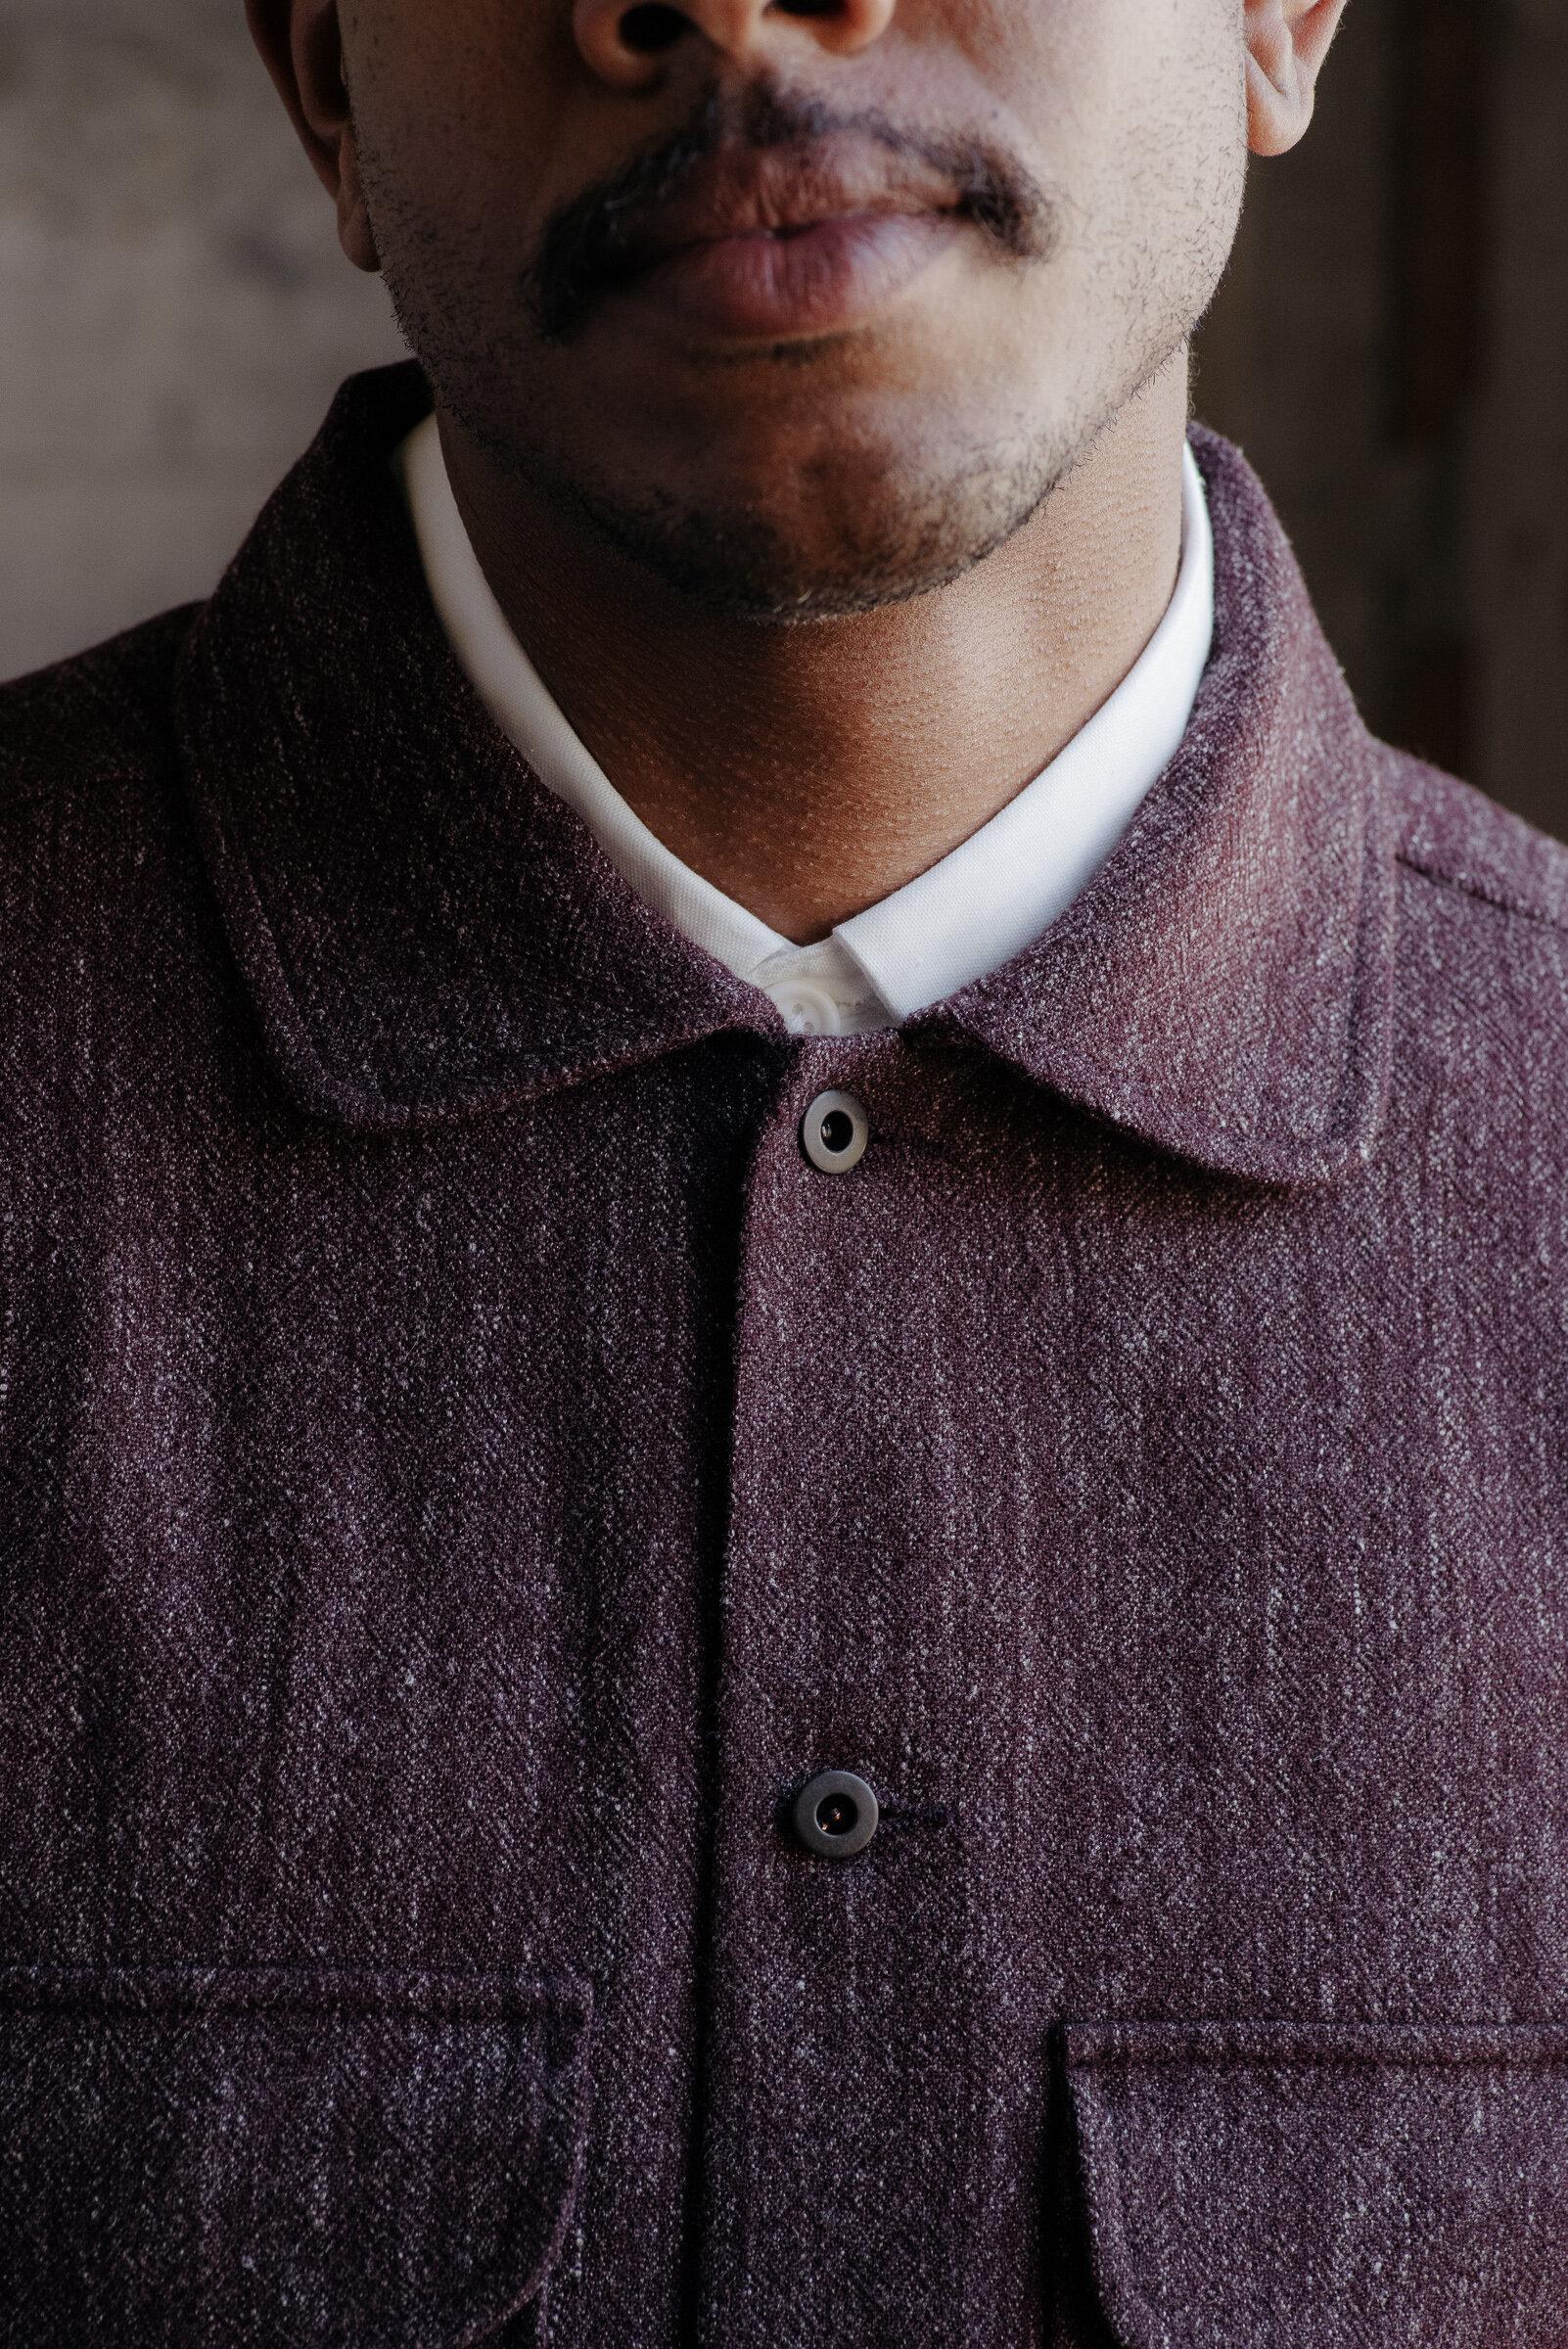 evan-kinori-field-shirt-wool-linen-woven-japan-7